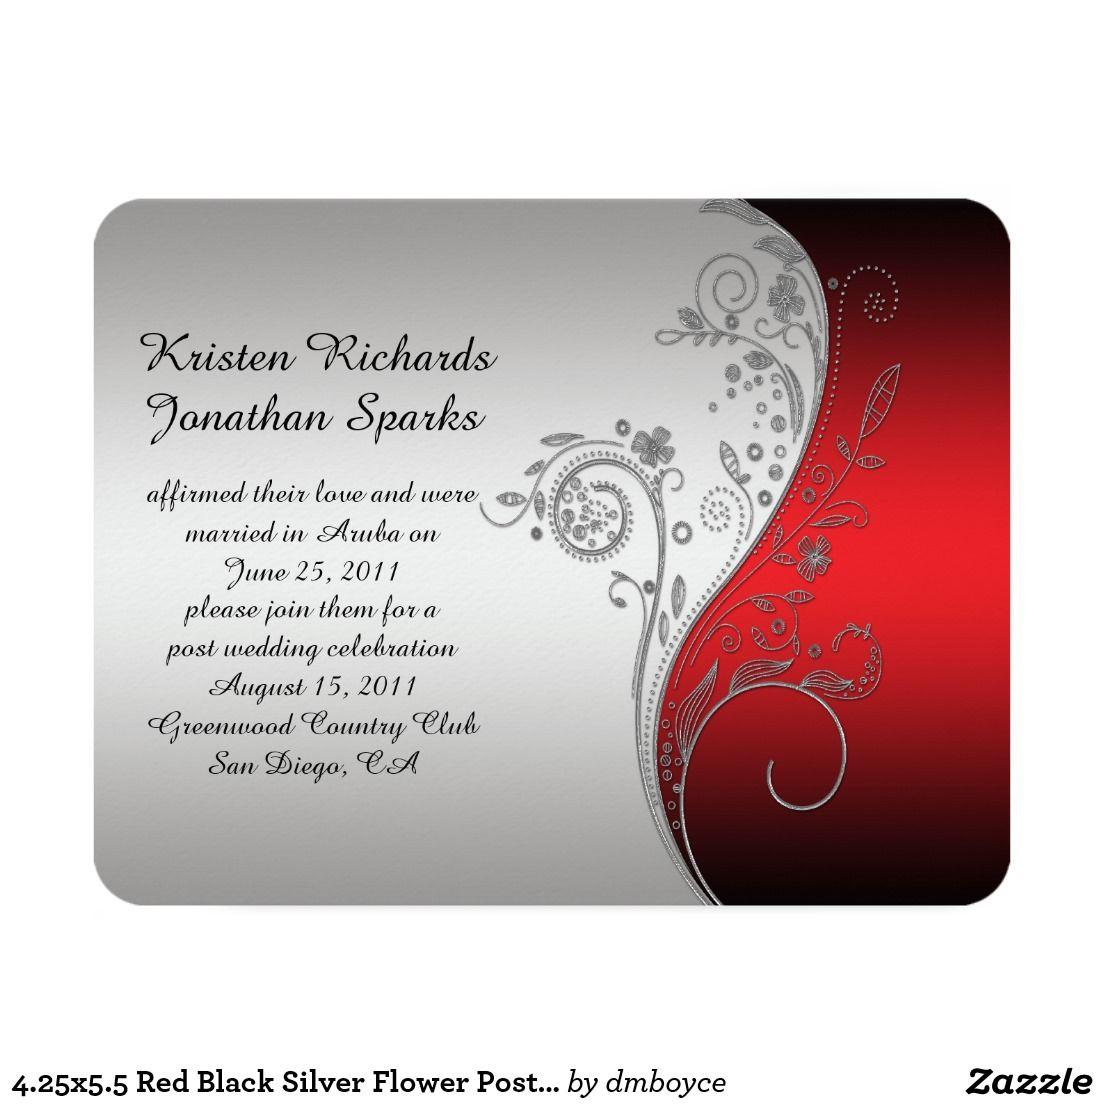 4.25x5.5 Red Black Silver Flower Post Wedding Invitation | Silver ...